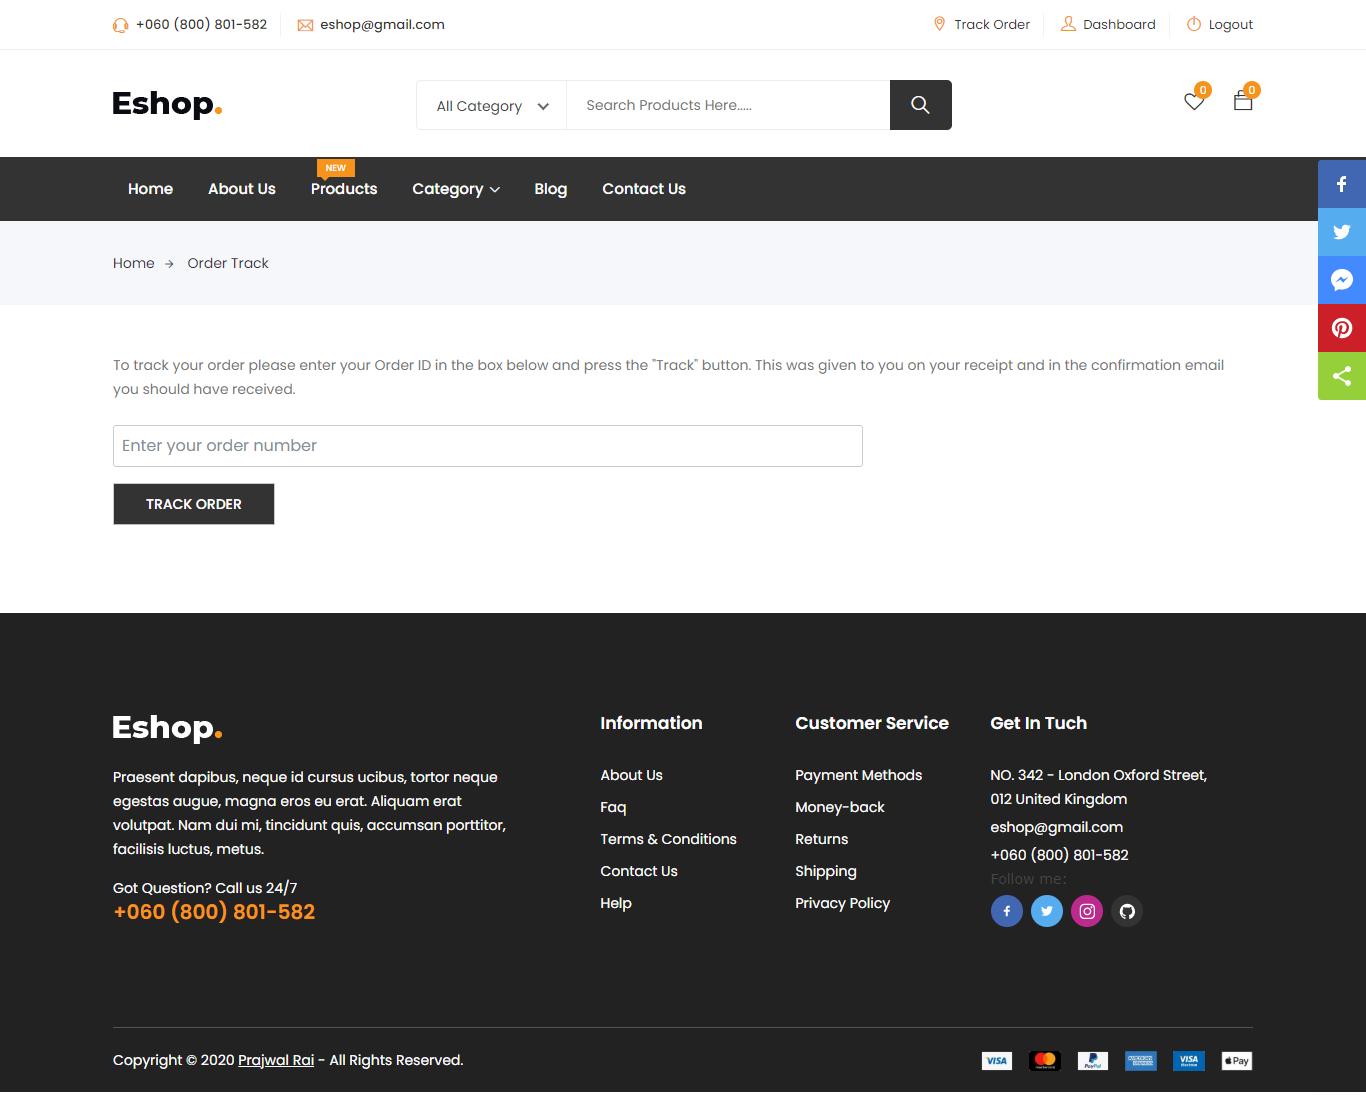 screencapture-e-shop-loc-product-track-2020-08-14-18_51_07